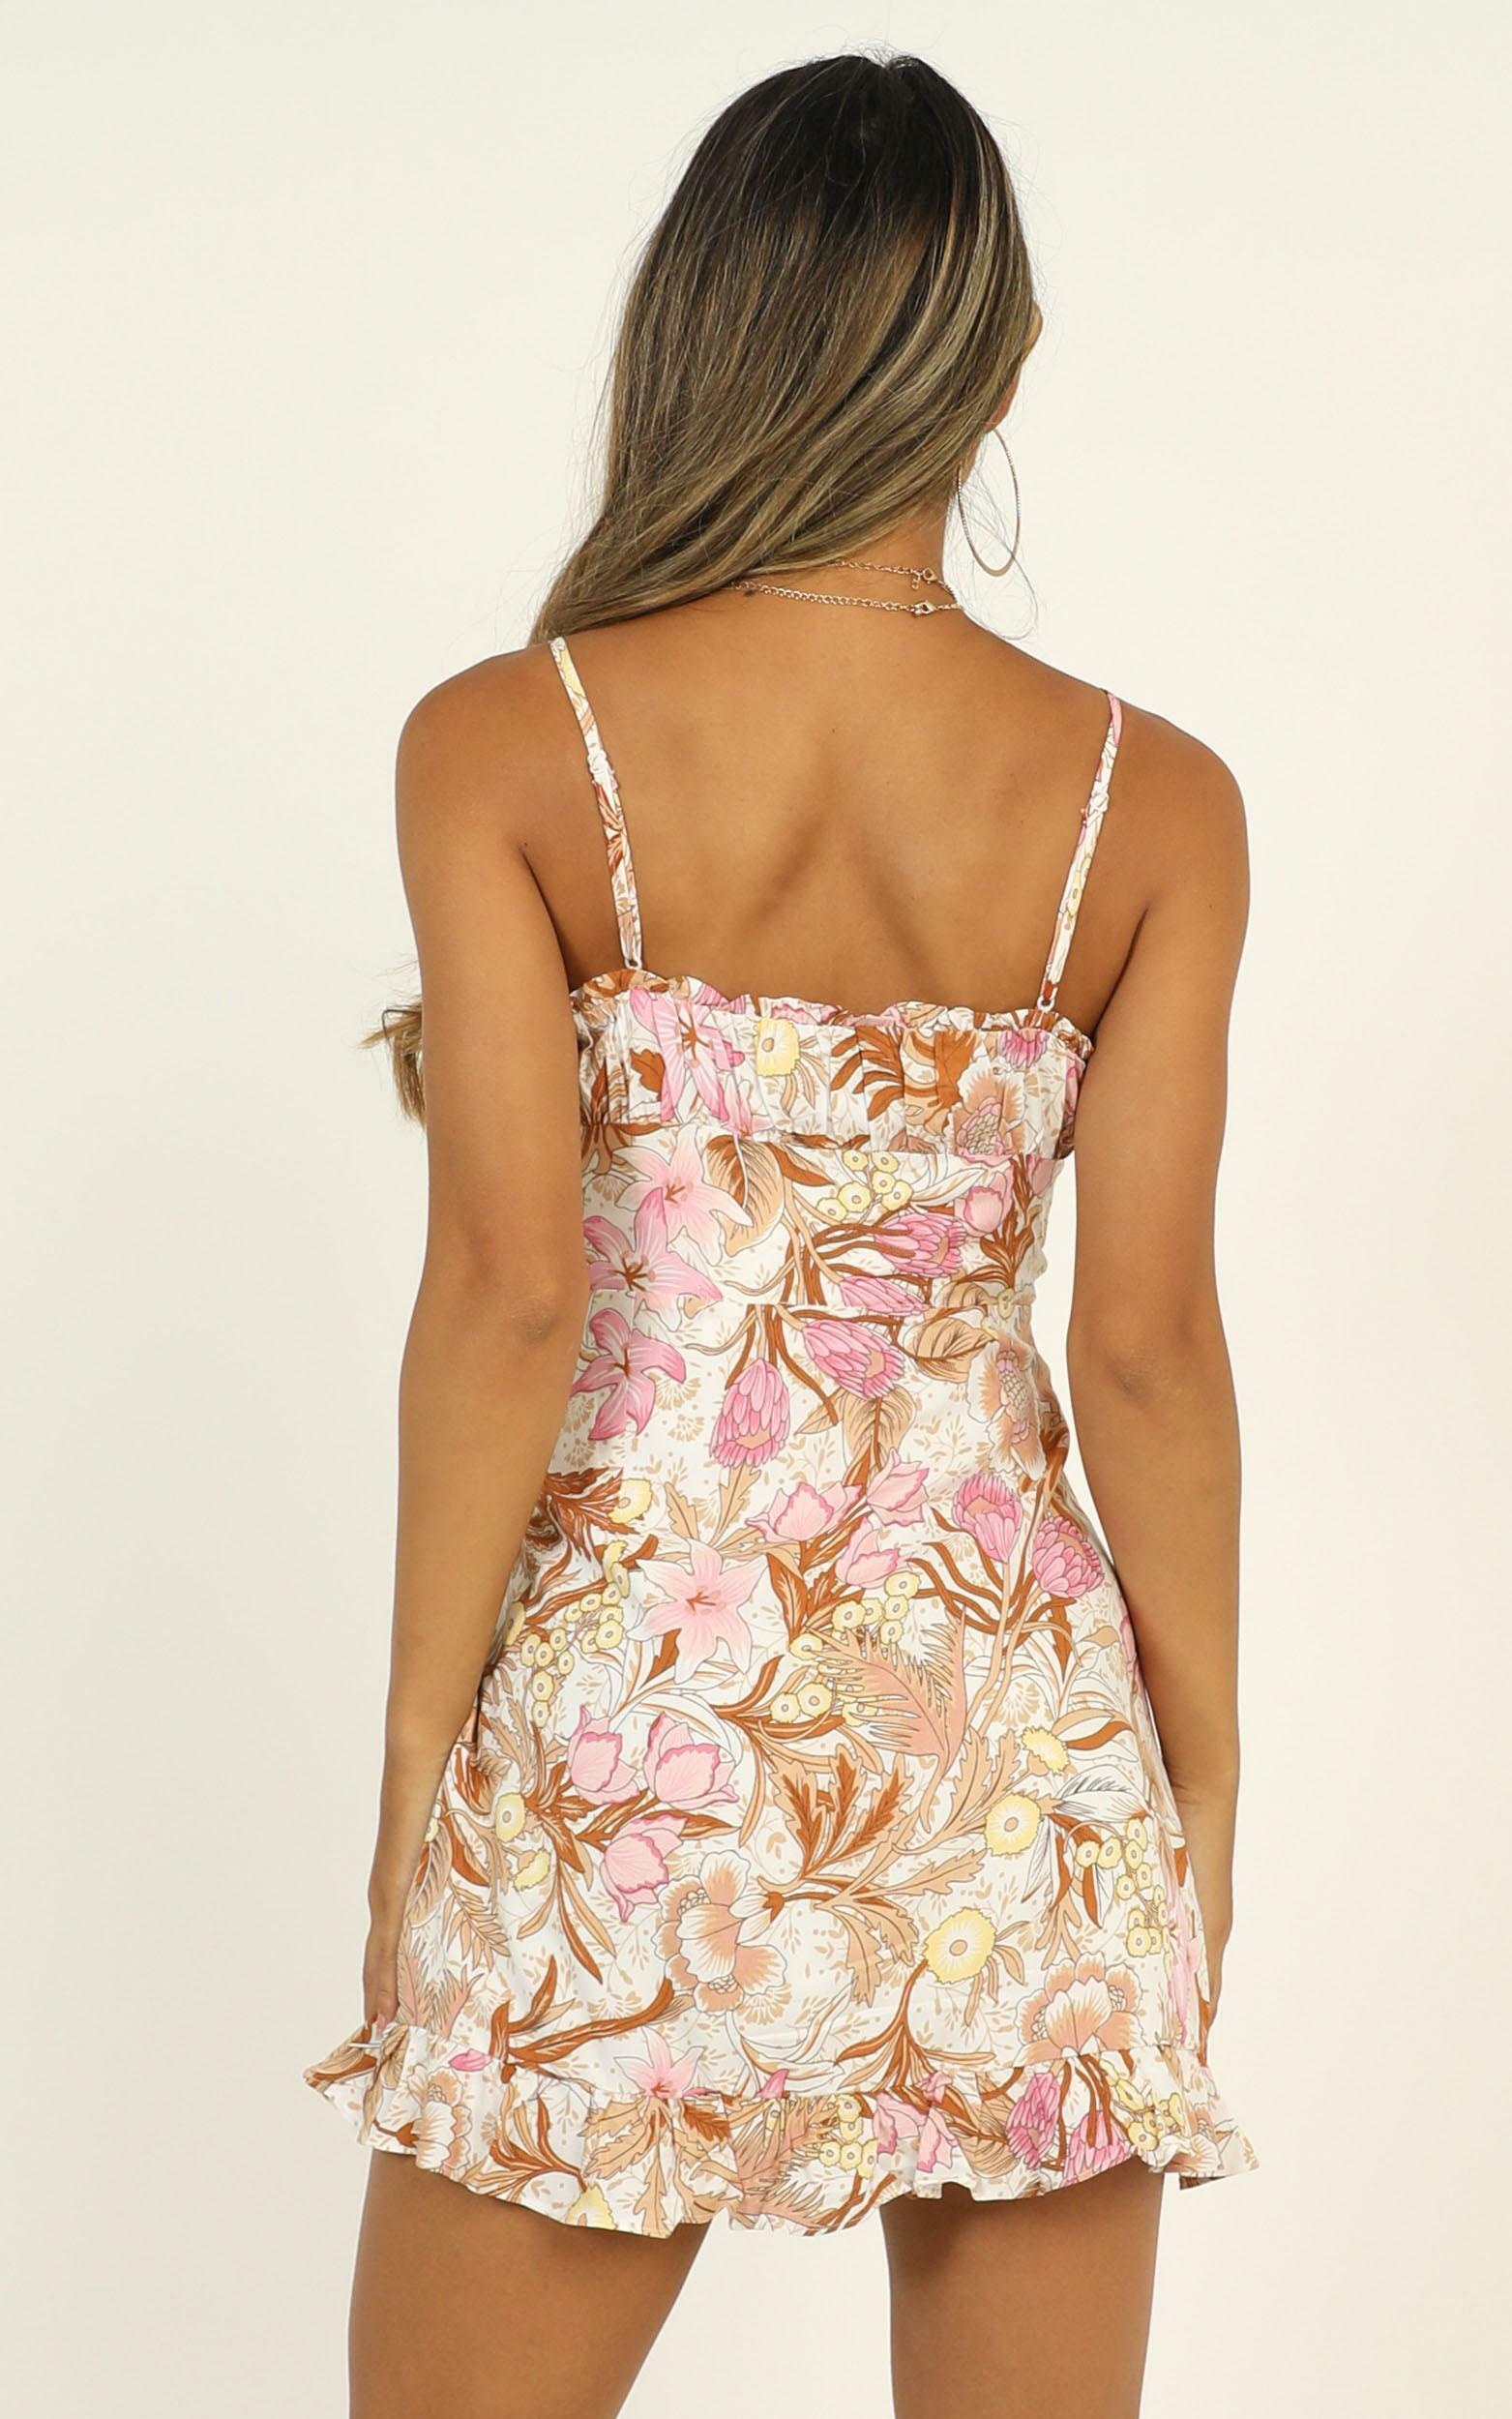 Callie Dress in Pink Tropical Floral, Orange, hi-res image number null